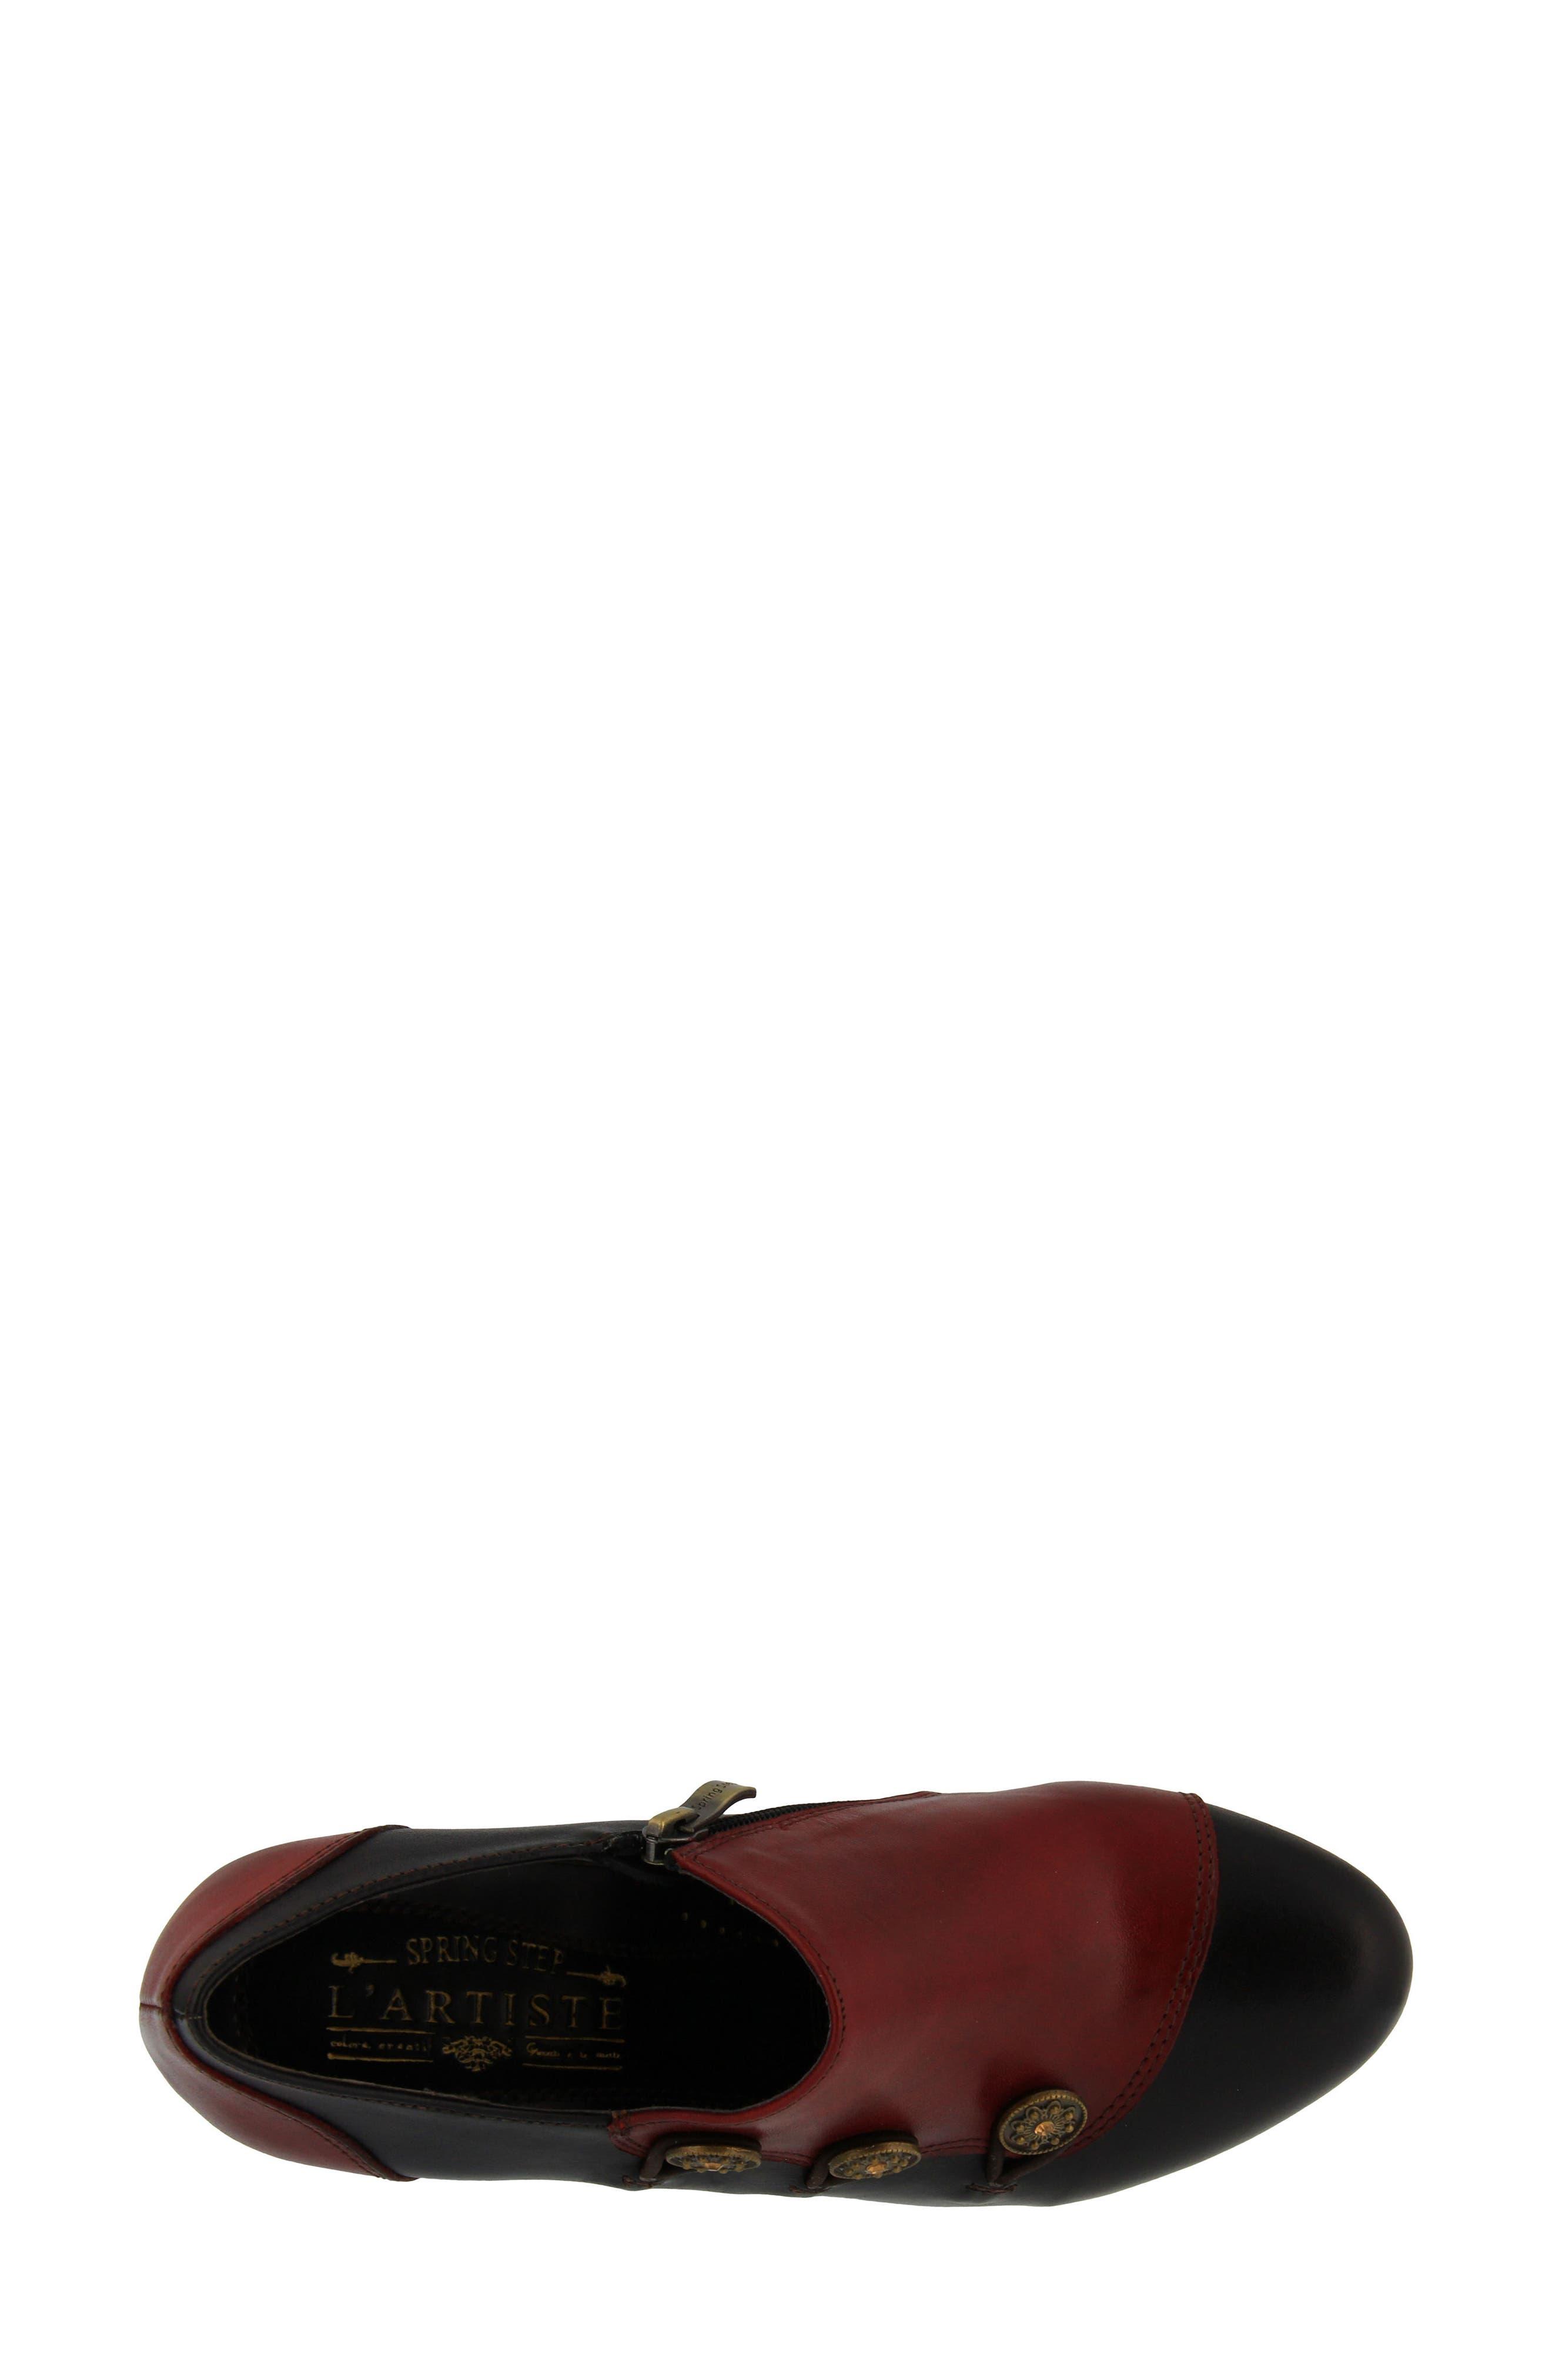 L'Artiste Greentea Pump,                             Alternate thumbnail 4, color,                             Red Multi Leather